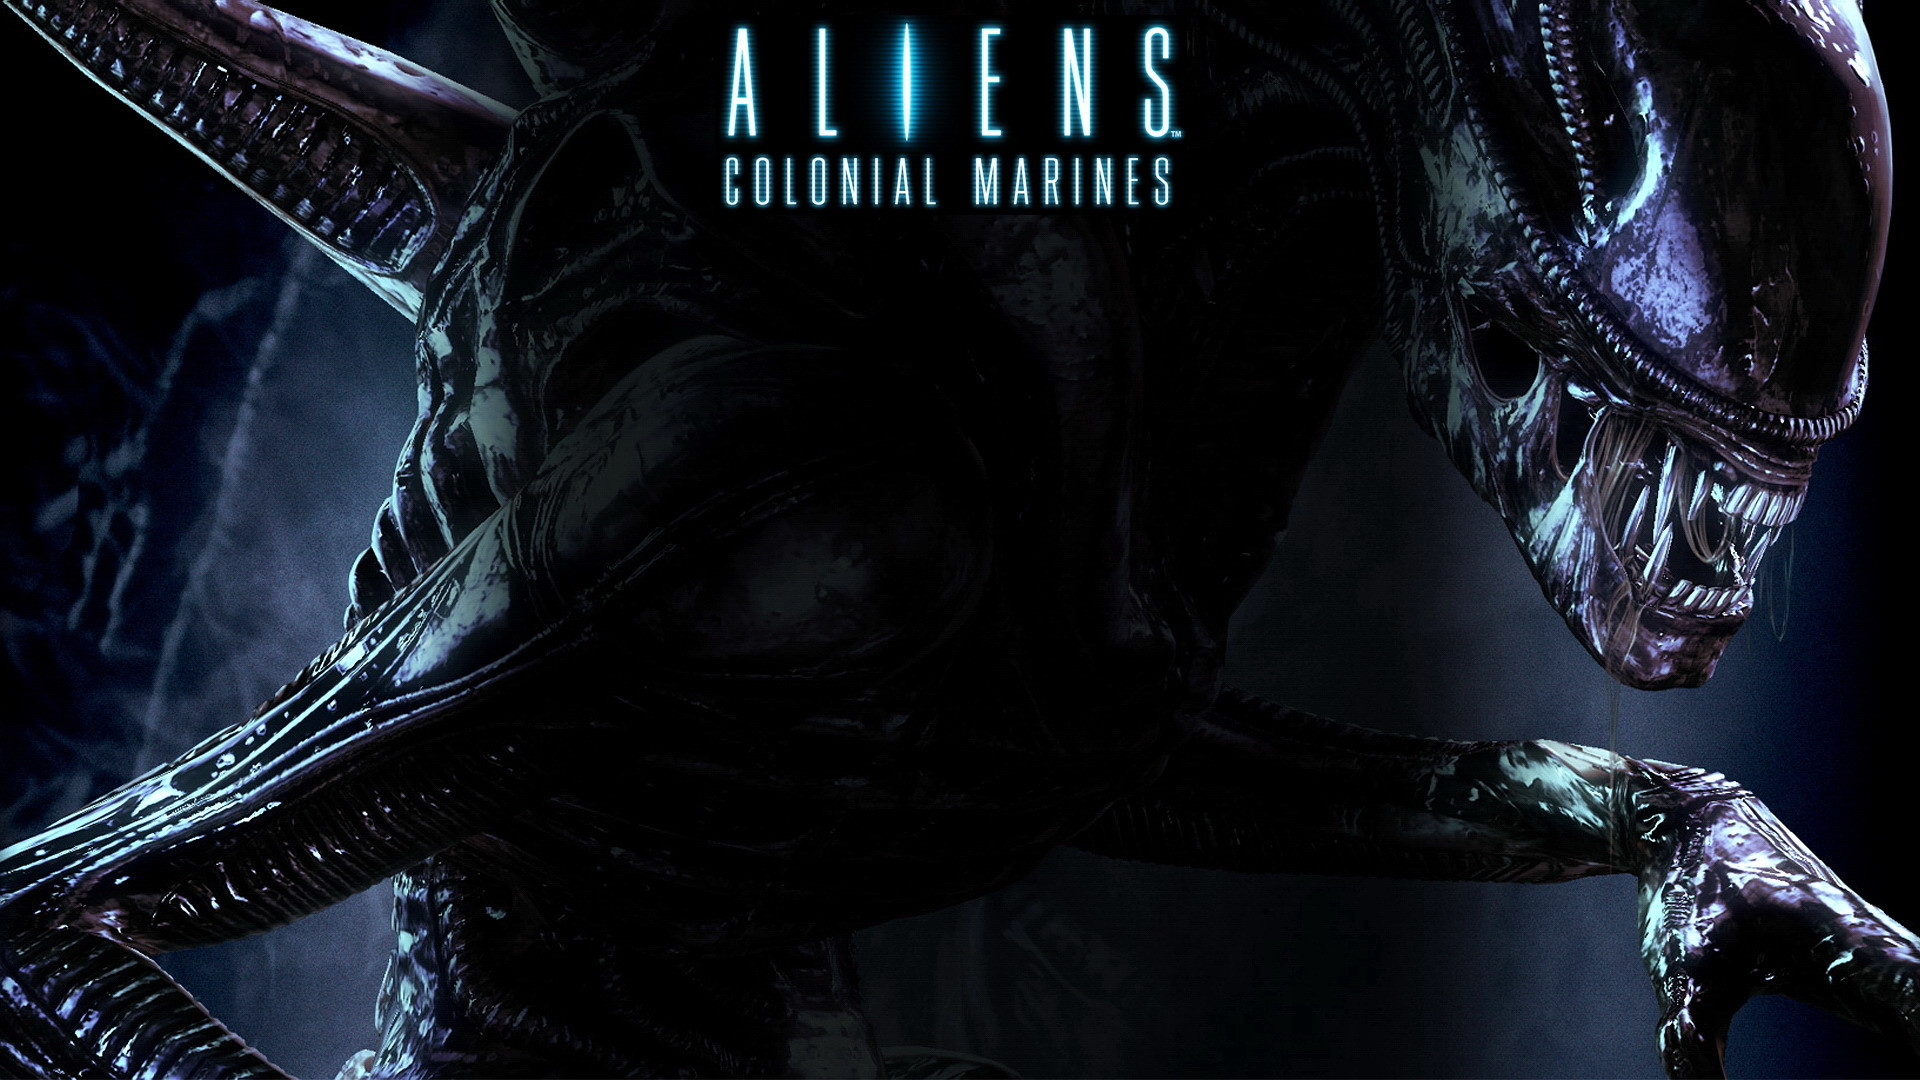 Aliens Colonial Marines Wallpaper Mobile